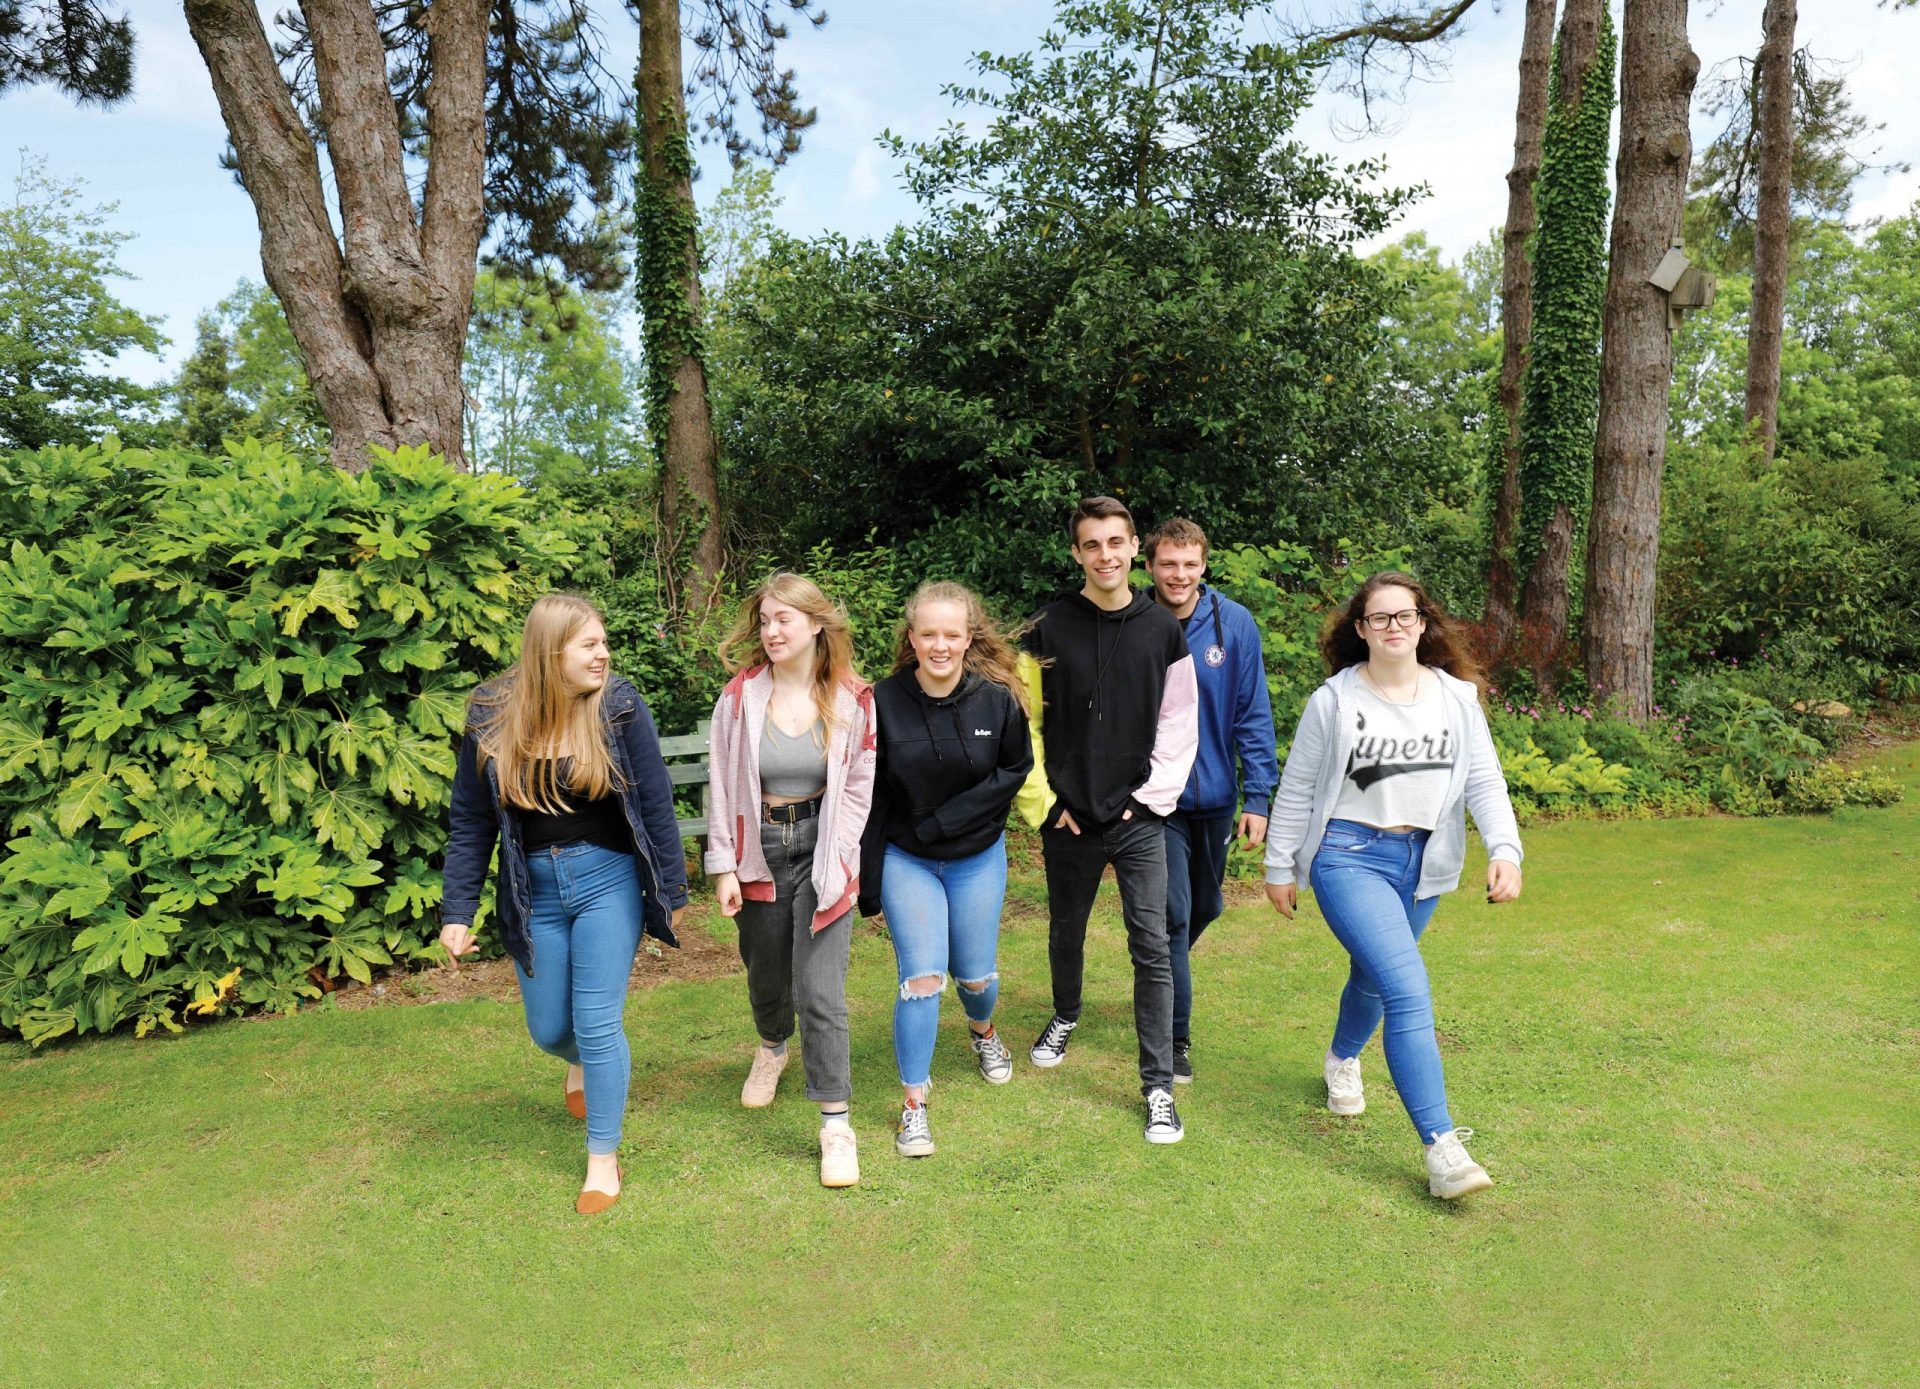 Group of students walking through garden smiling